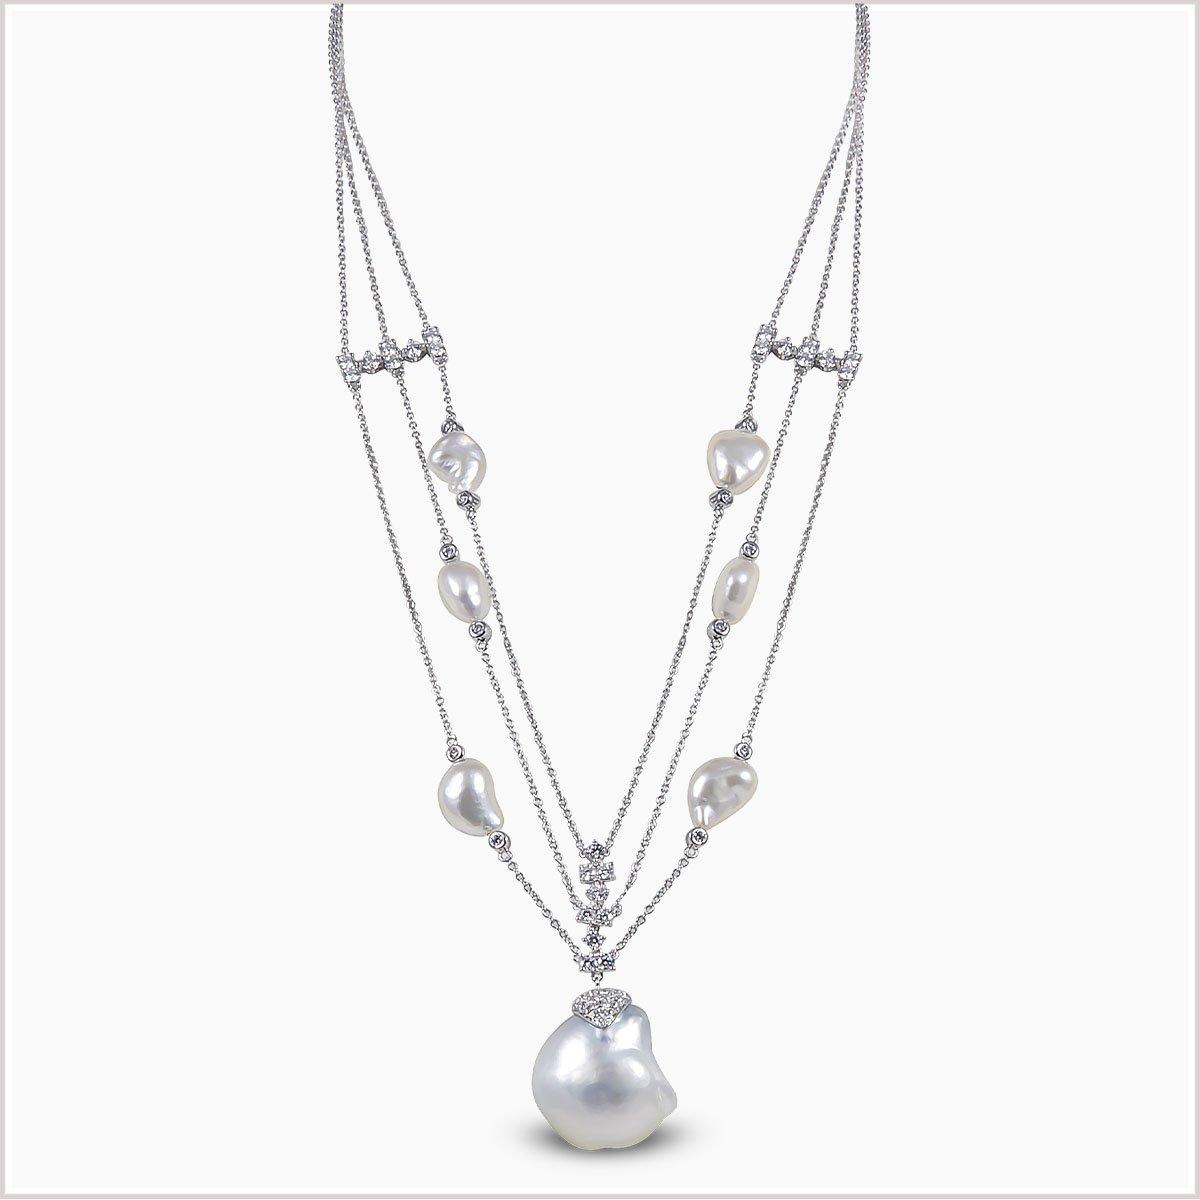 Yoko London Baroque South Sea Pearl and Diamond Necklace